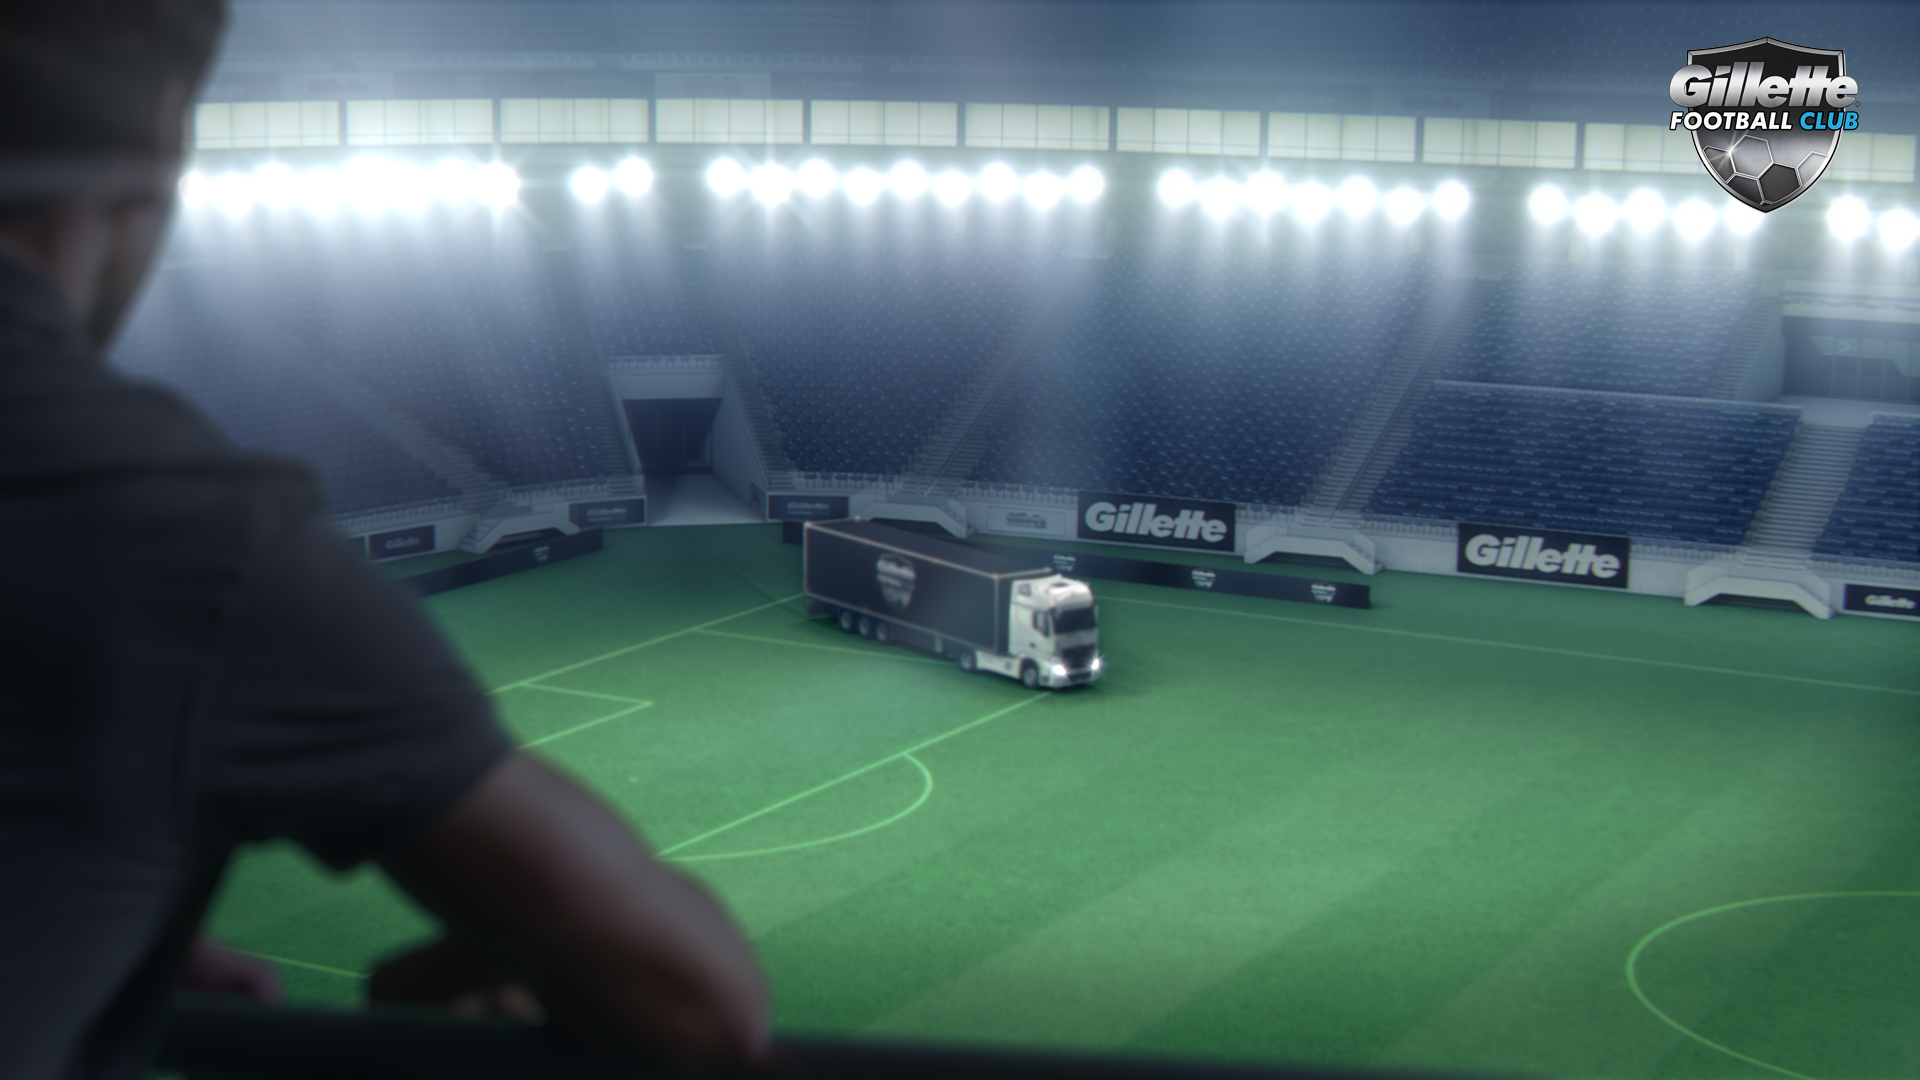 gillette_football_club_pic1